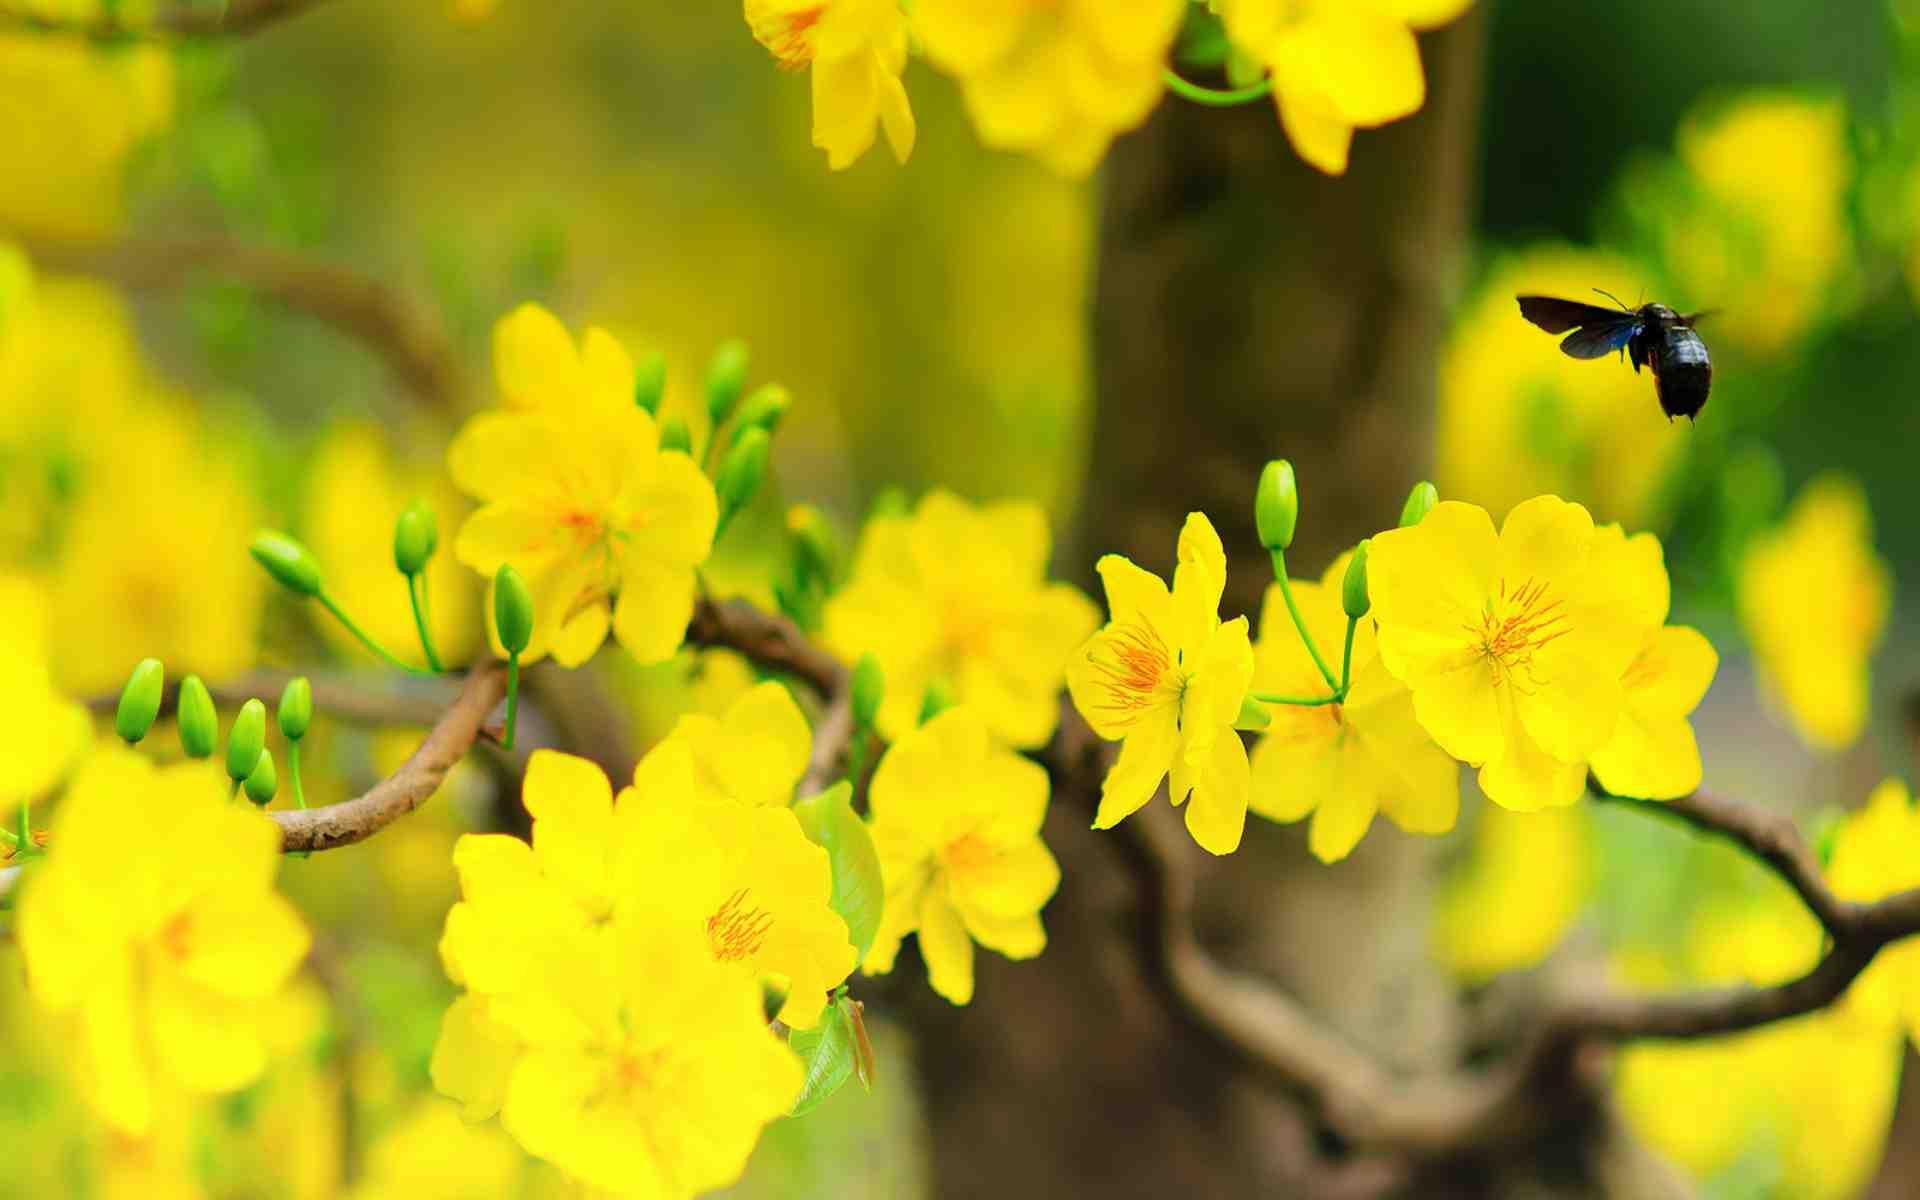 hình ảnh hoa mai